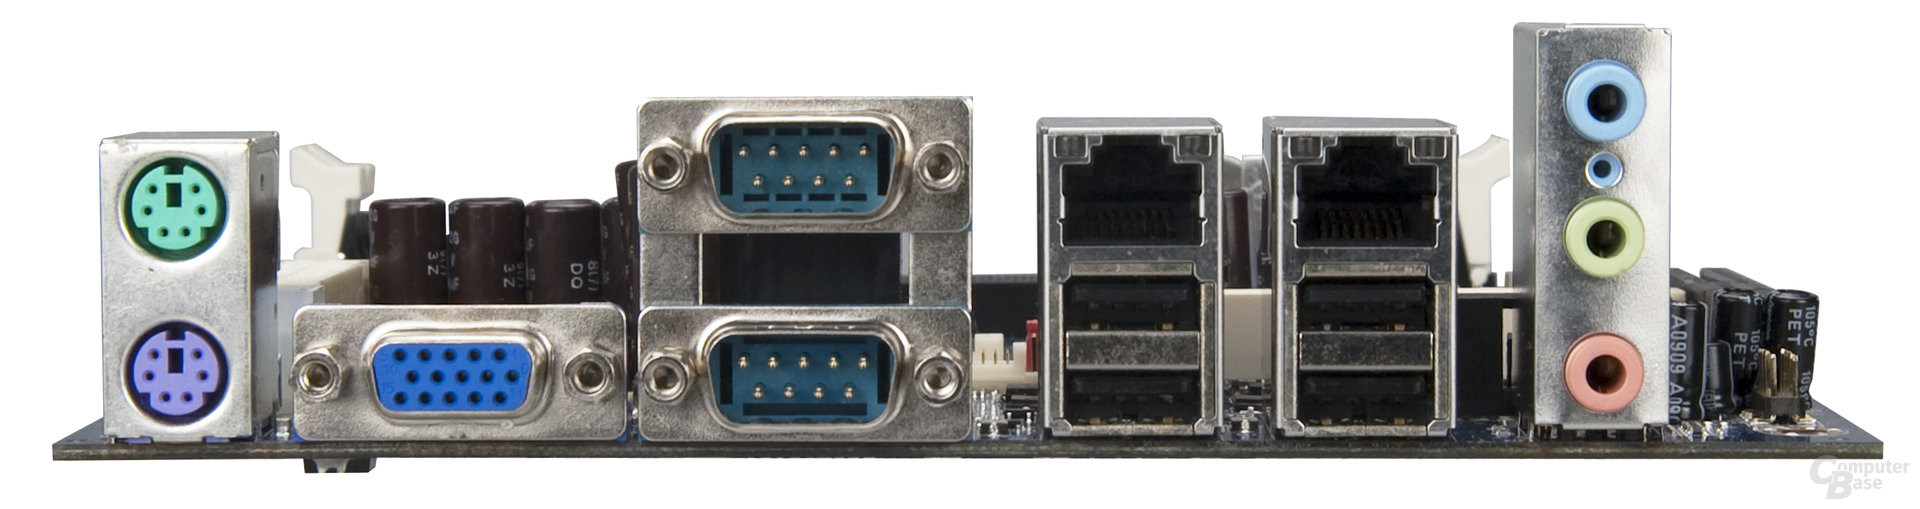 VIA EPIA-M840